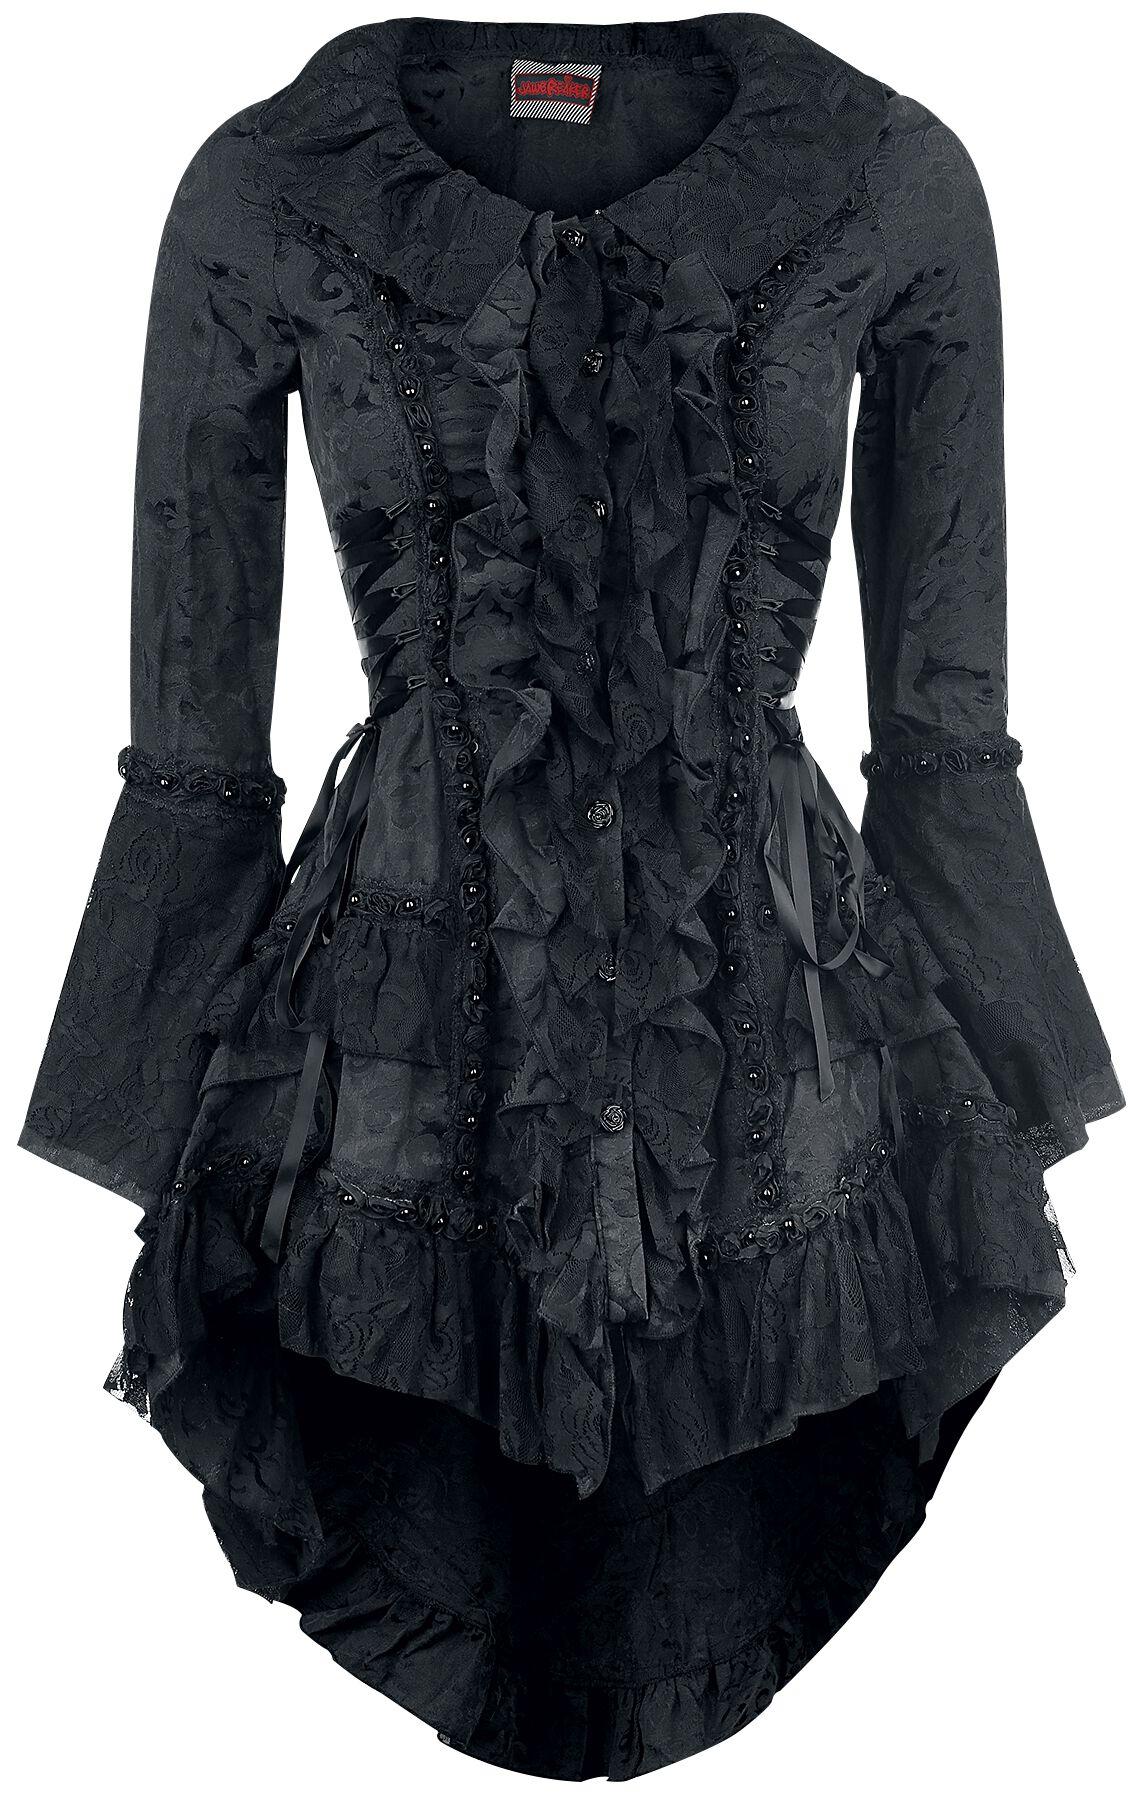 Marki - Bluzy - Kardigan damski Jawbreaker Victorian Jacket Kardigan damski czarny - 315261